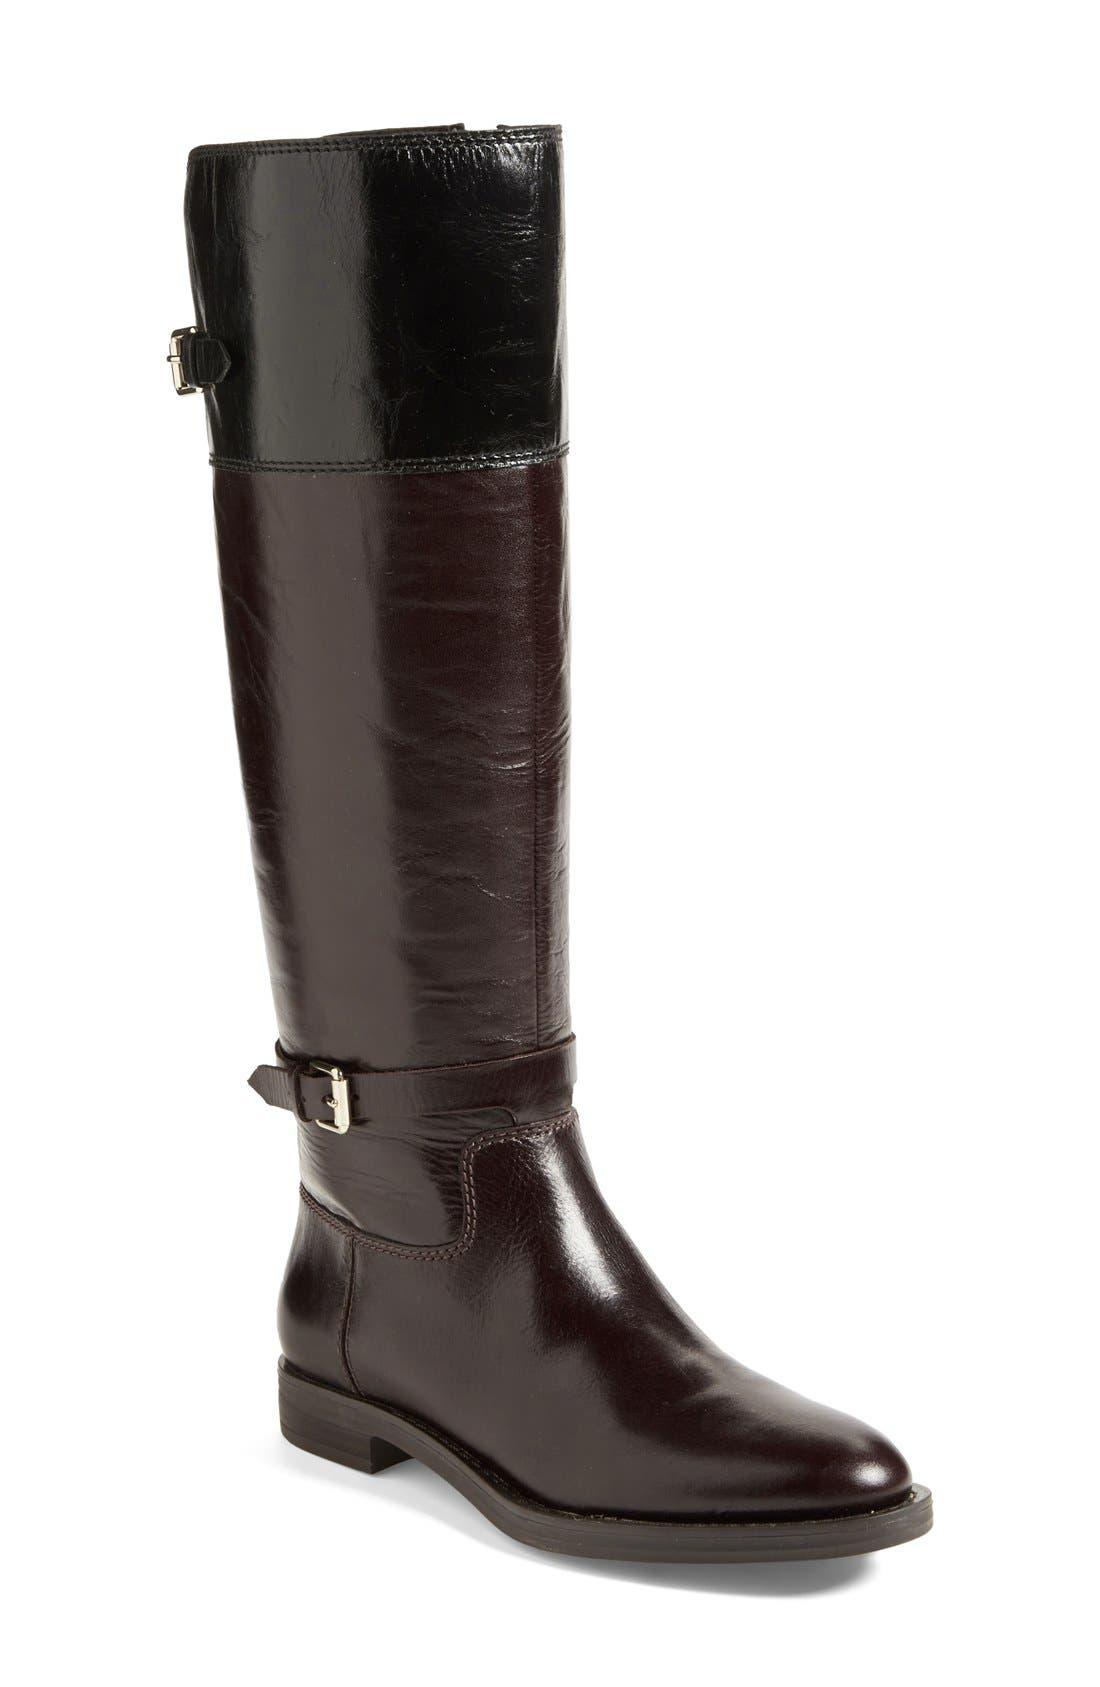 Main Image - Enzo Angiolini 'Eero' Leather Boot (Women)